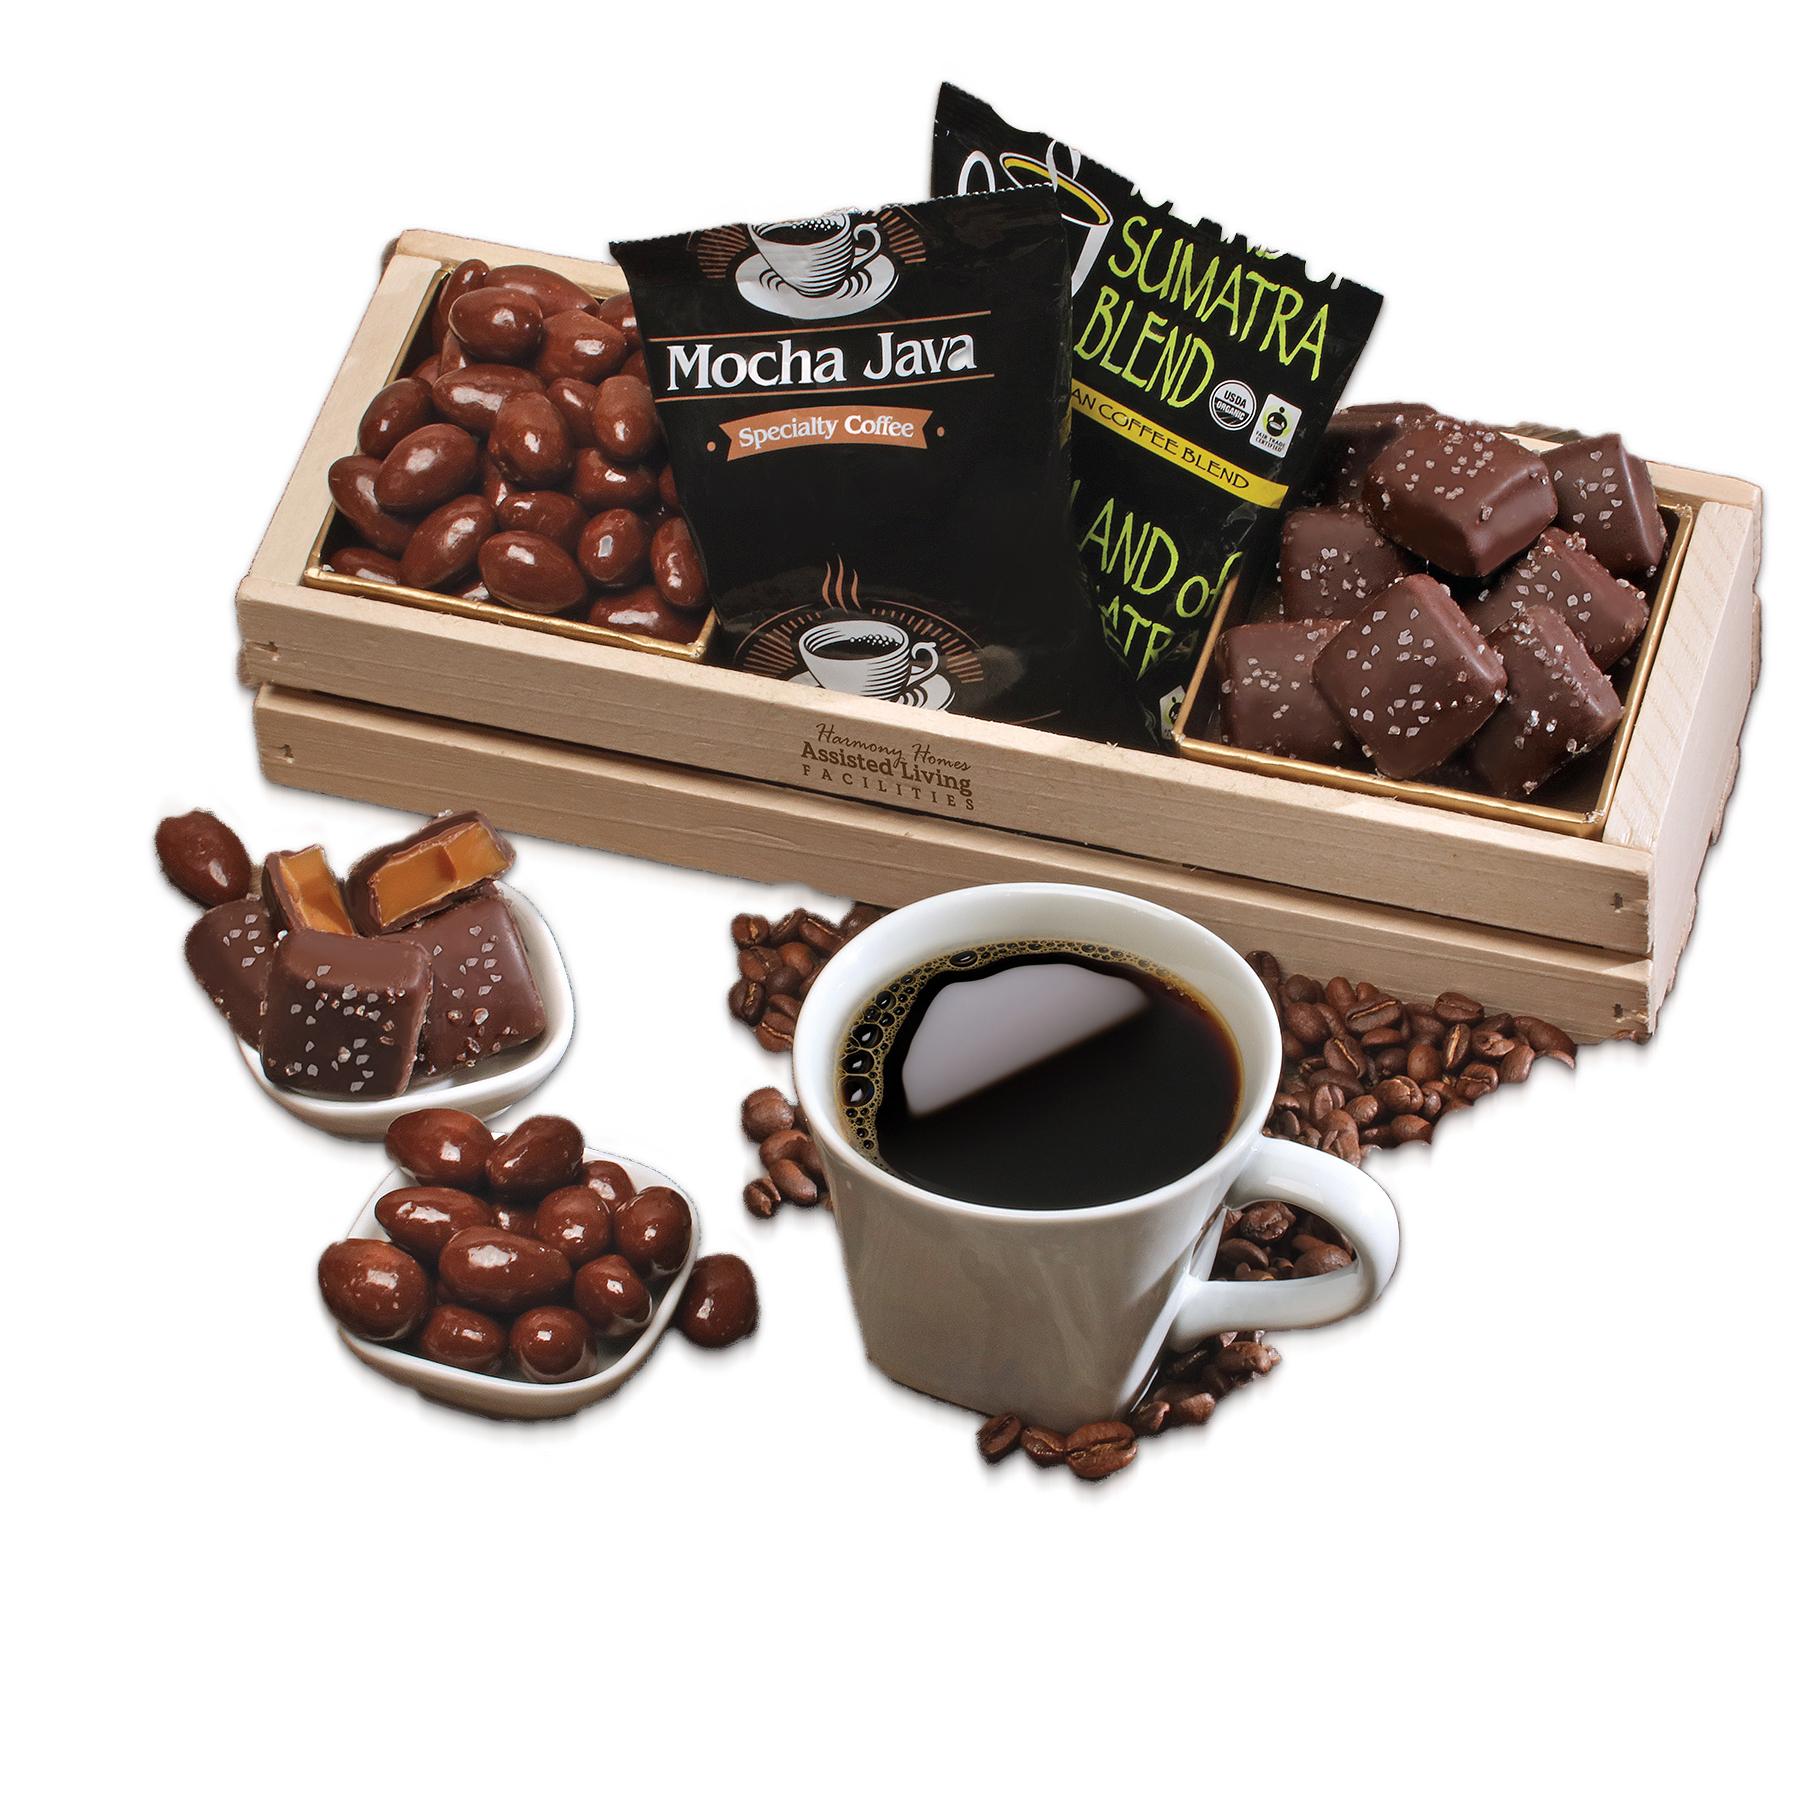 Custom Chocolate & Coffee Crate